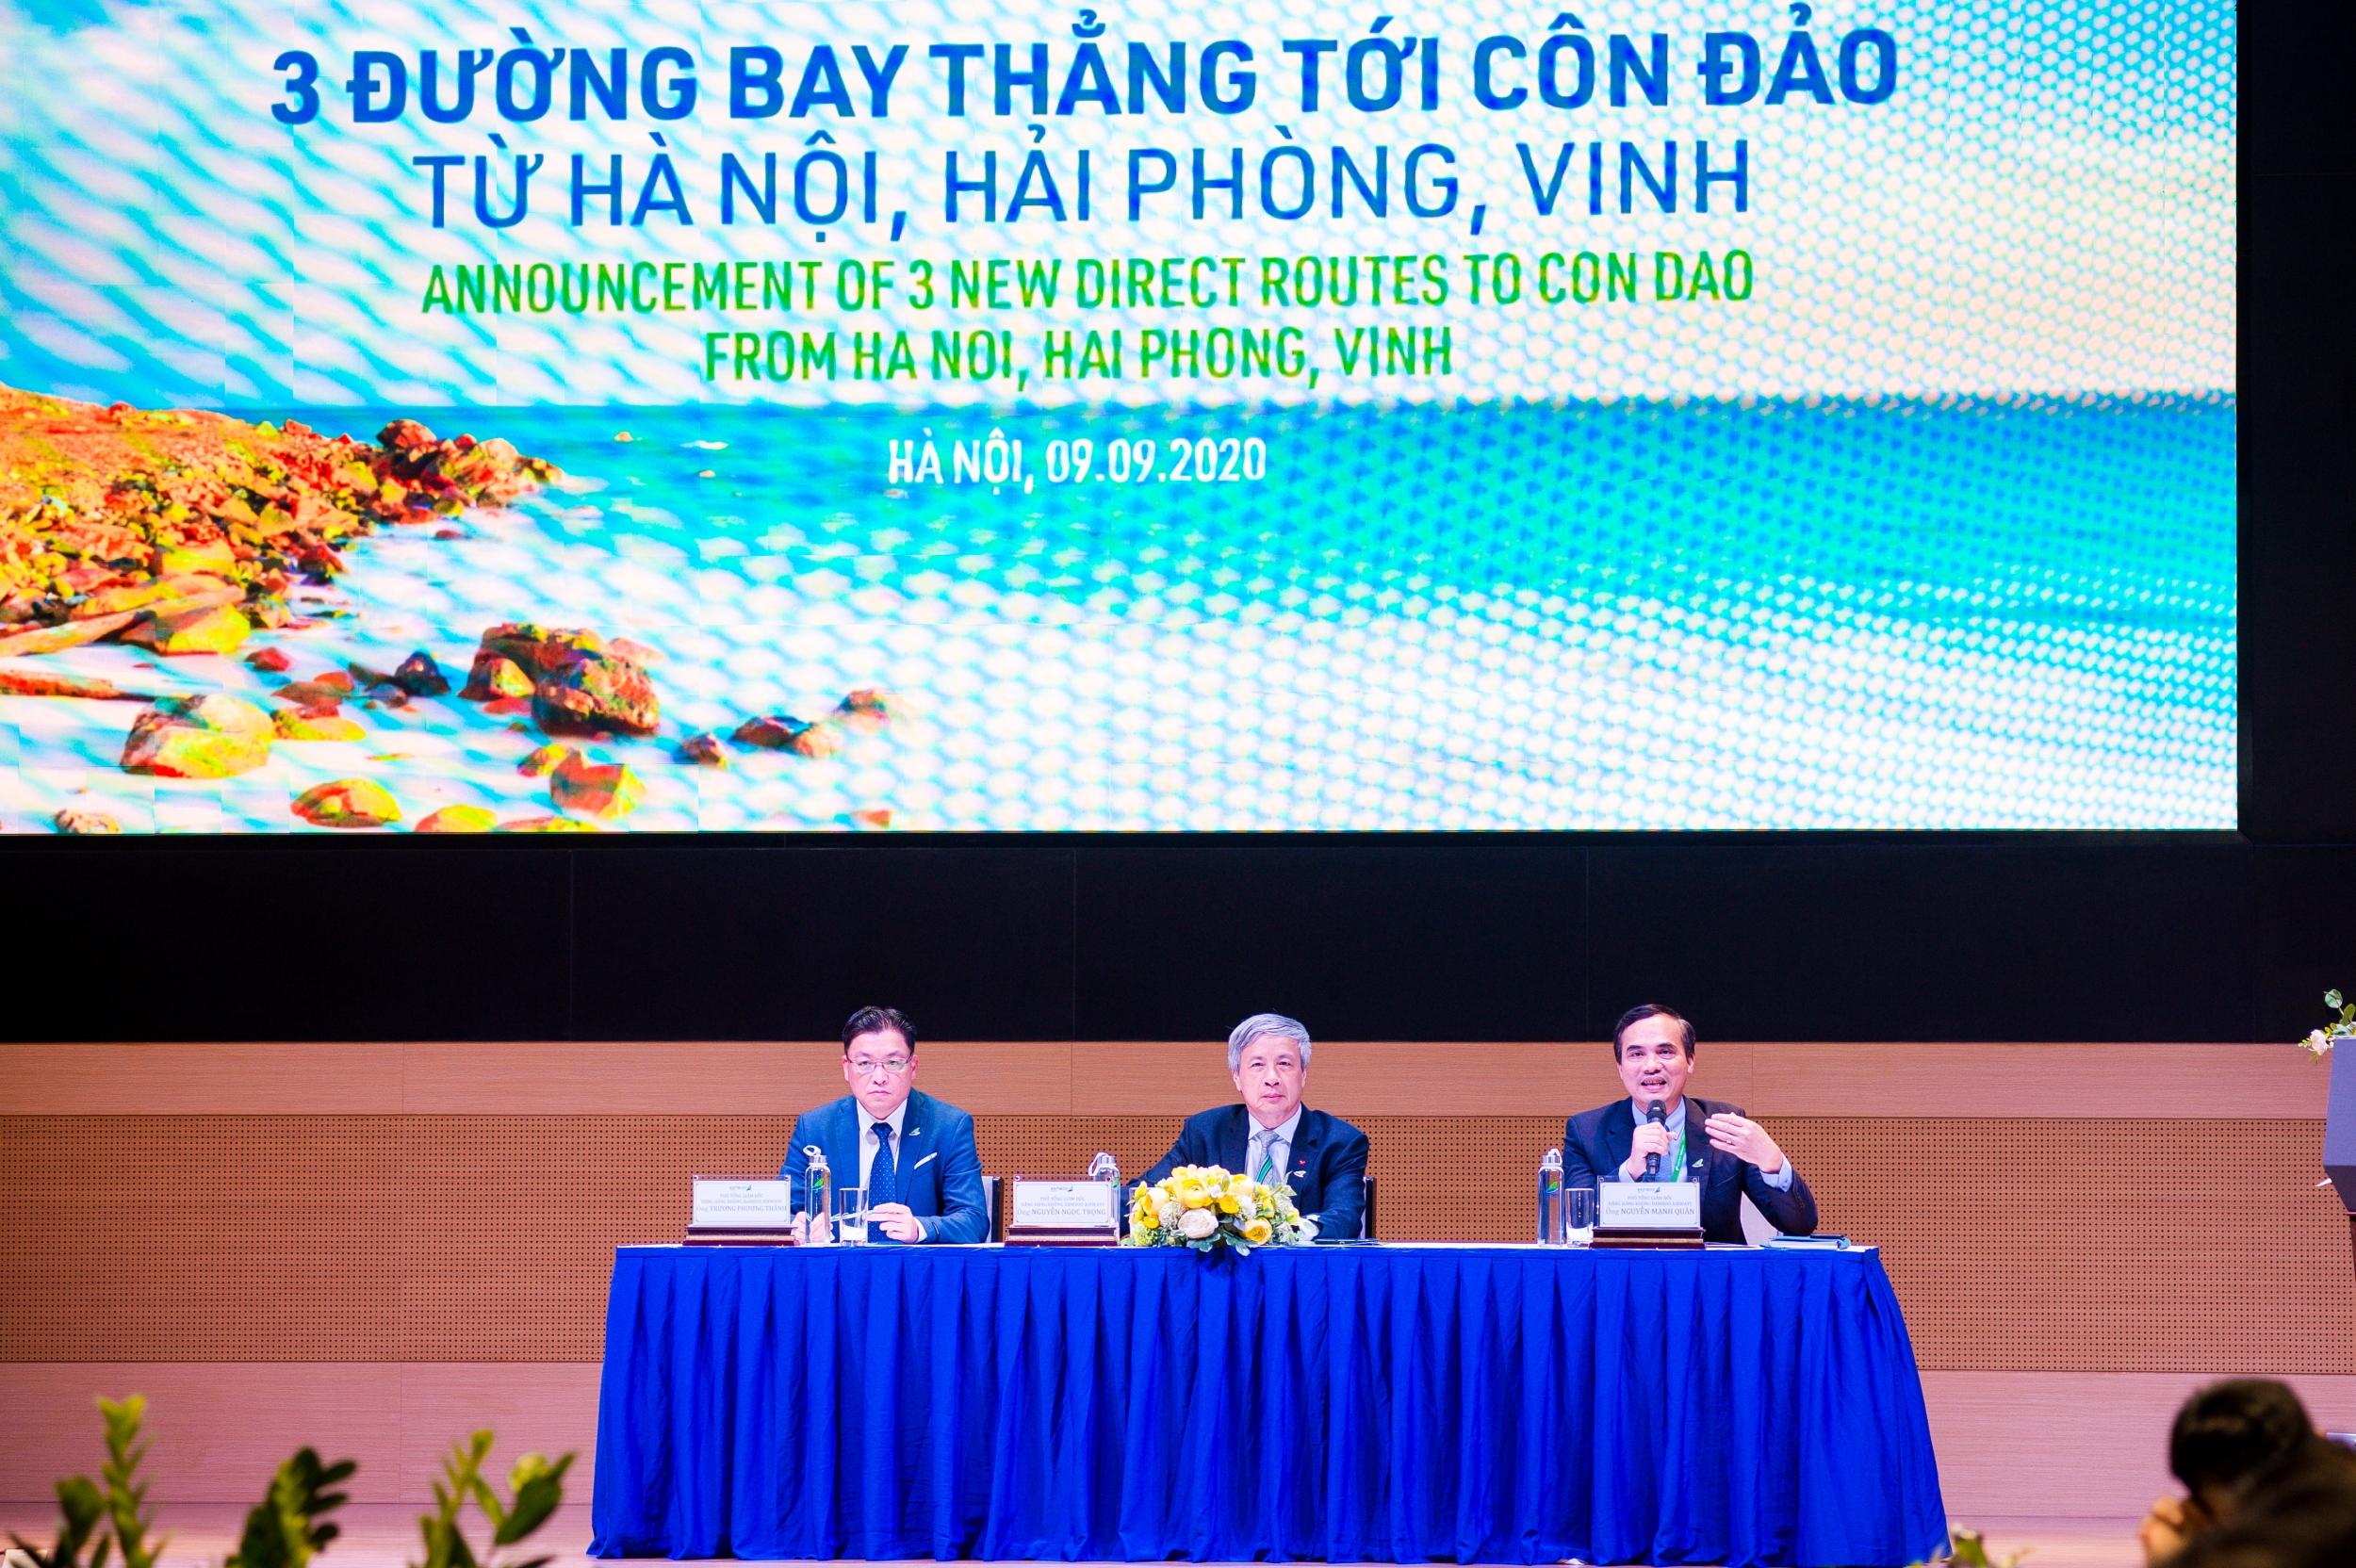 bay-thang-con-dao-cua-bamboo-airways-co-doanh-thu-hay-bu-lo